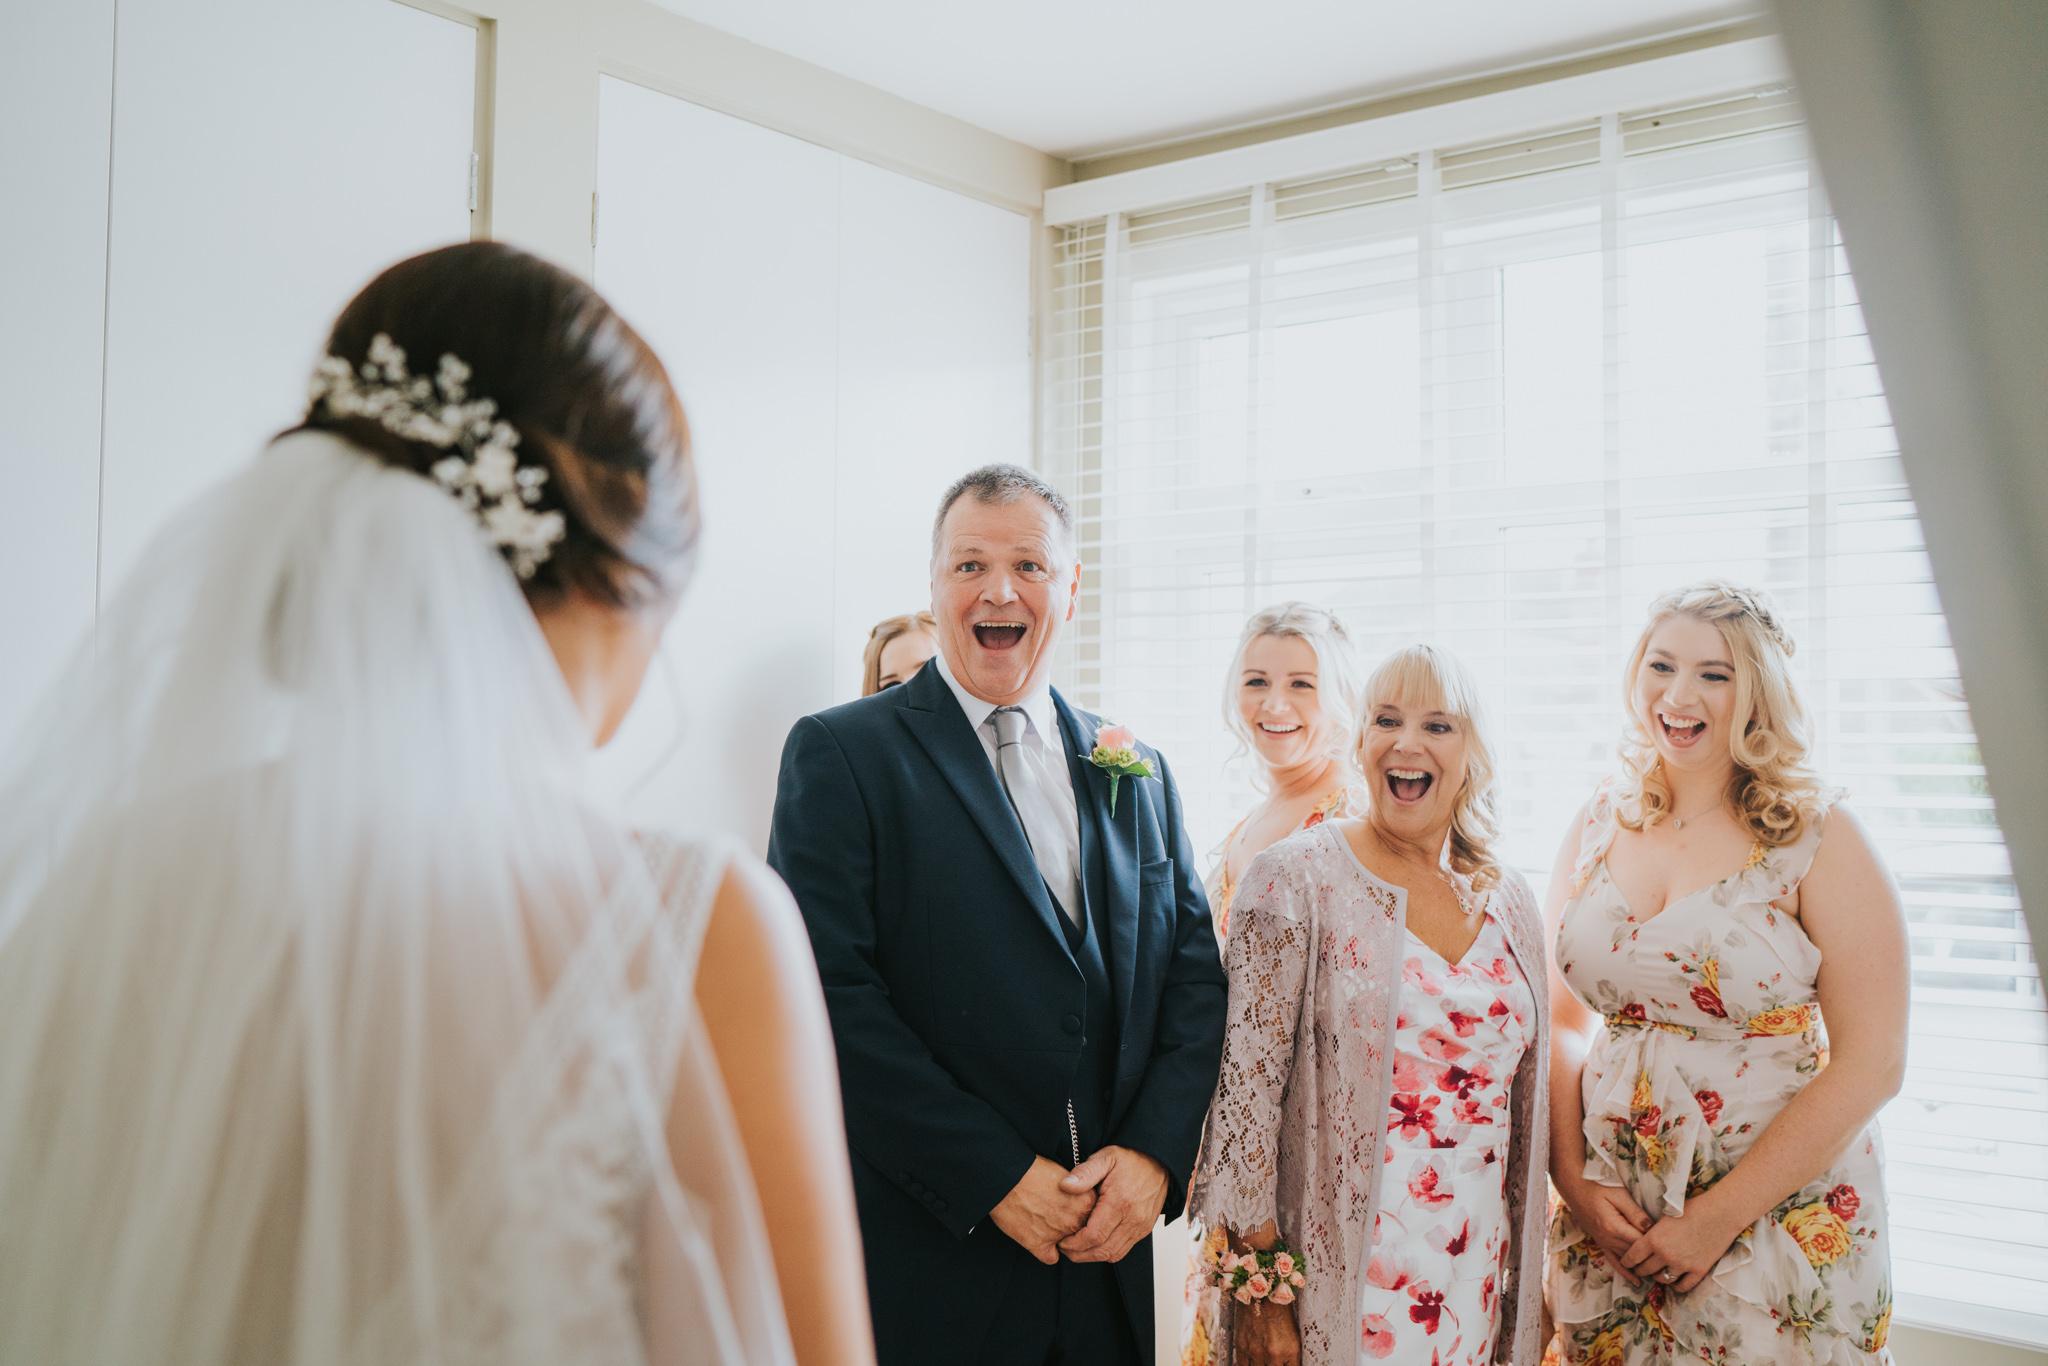 sophie-mark-newland-hall-boho-wedding-grace-elizanbeth-alternative-wedding-photographer-colchester-essex-norfolk-suffolk-devon+(60+of+161).jpg